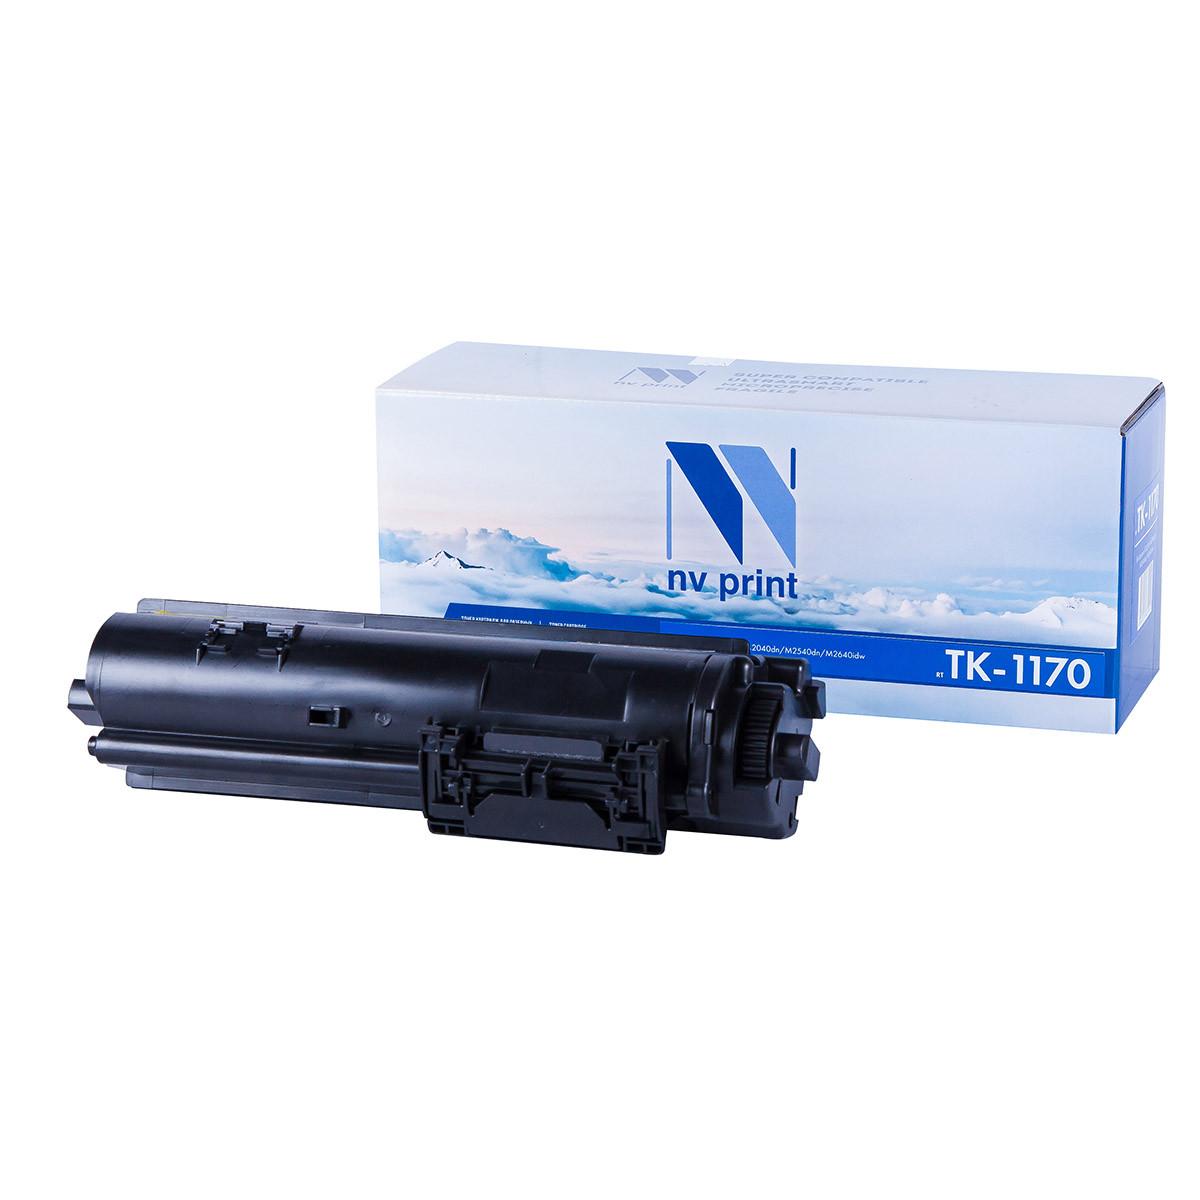 Тонер картридж NV Print NV-TK-1170 (БЕЗ ЧИПА) (Совместимый (дубликат) Черный - Black) NV-TK1170NC